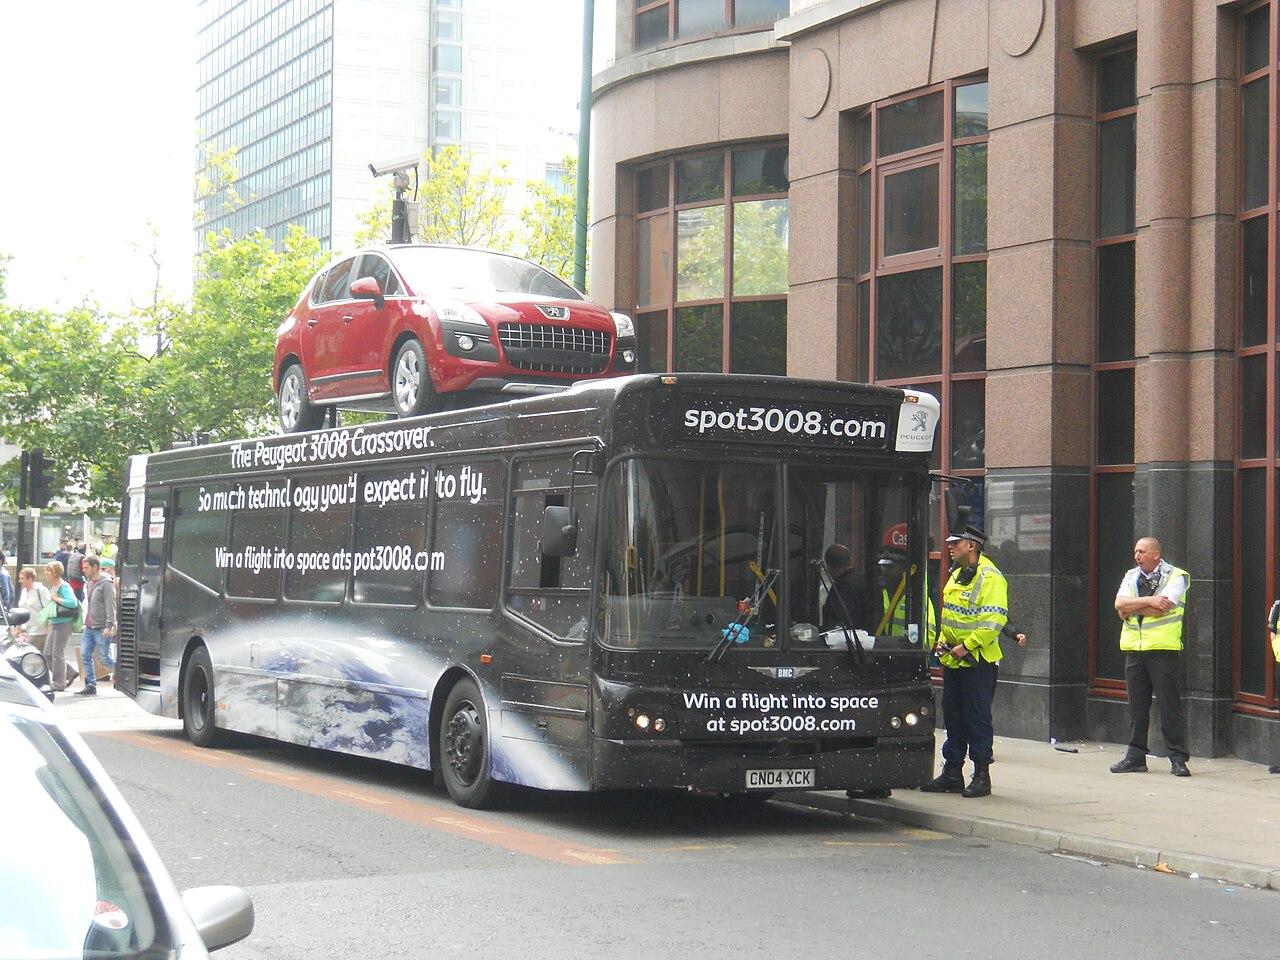 File Peugeot 3008 Promtional Bus Cn04 Xck 2004 Bmc